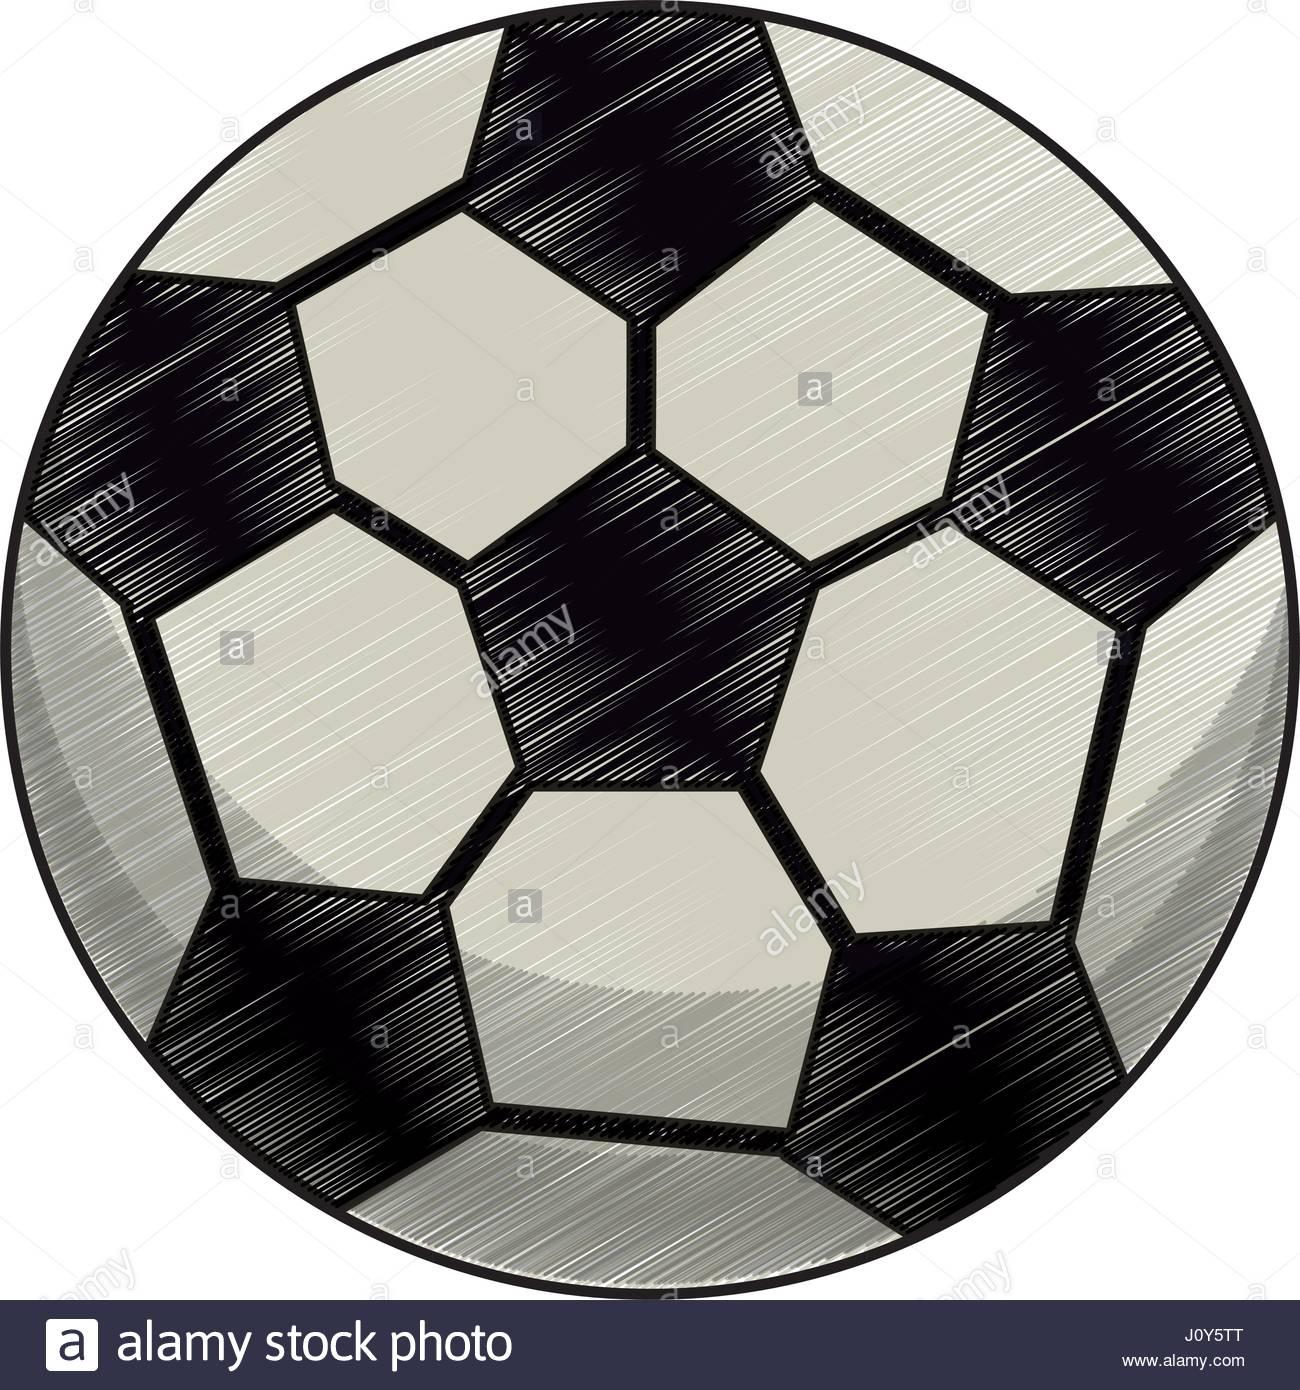 1300x1390 Drawing Soccer Ball Equipment Stock Vector Art Amp Illustration